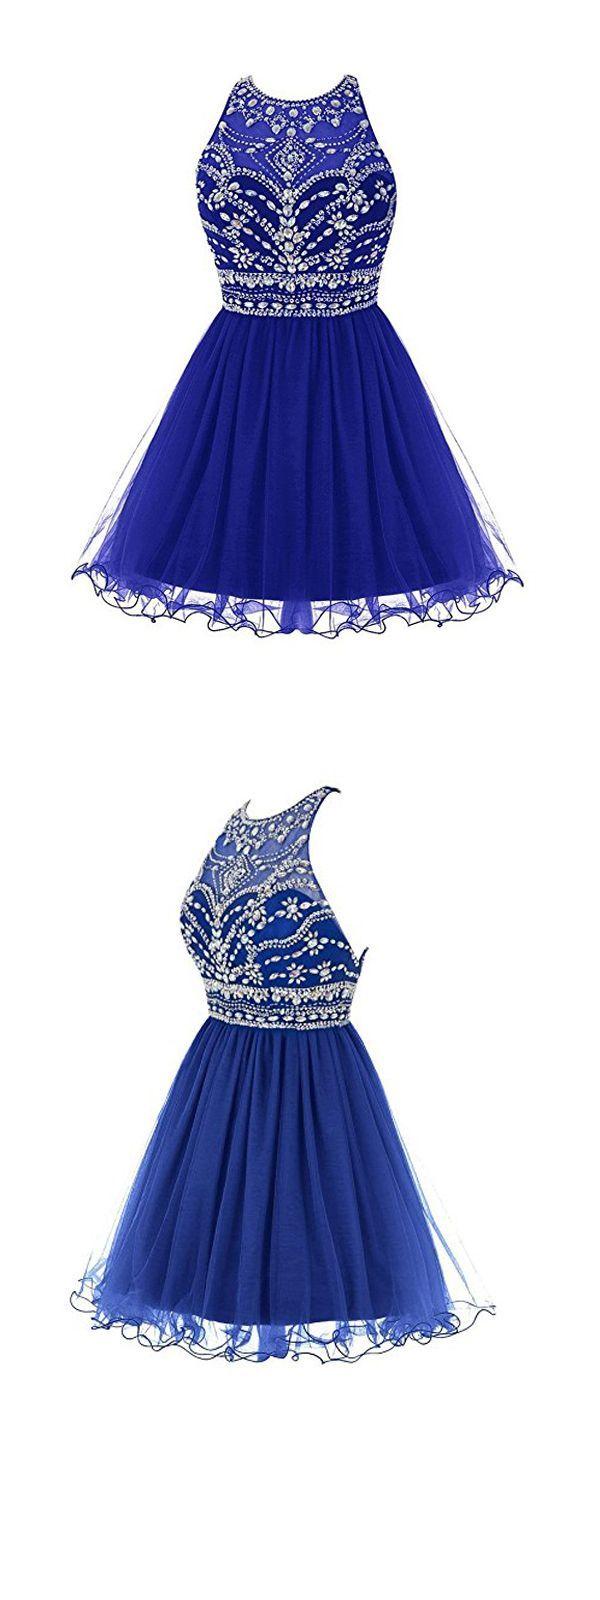 Royal blue prom dressbeaded prom dressfashion homecoming dress